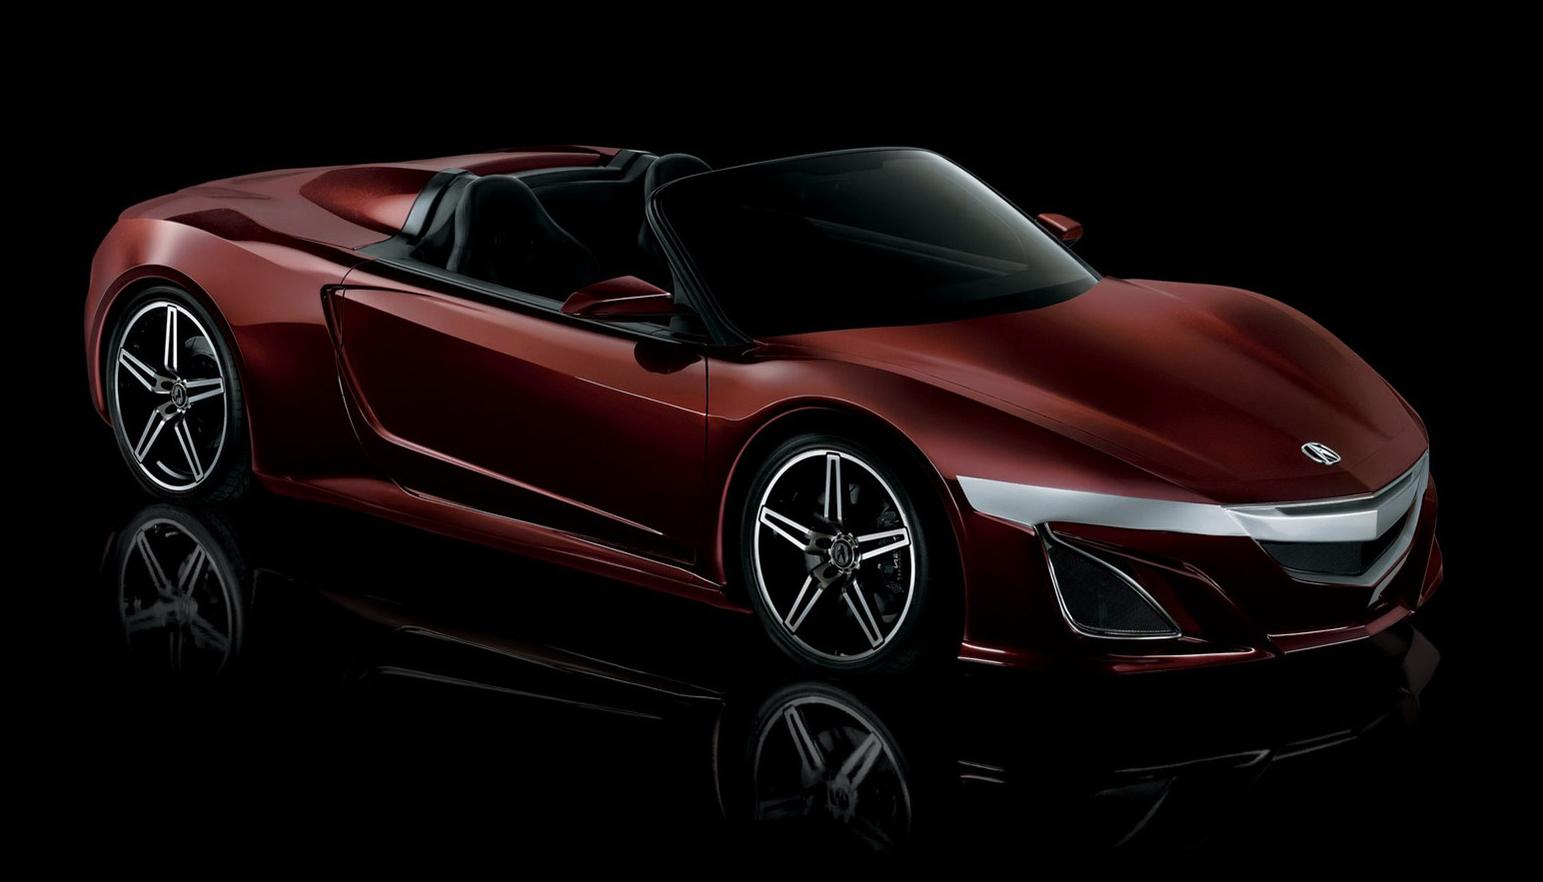 Acura NSX Roadster The True Star Of New Avengers Film